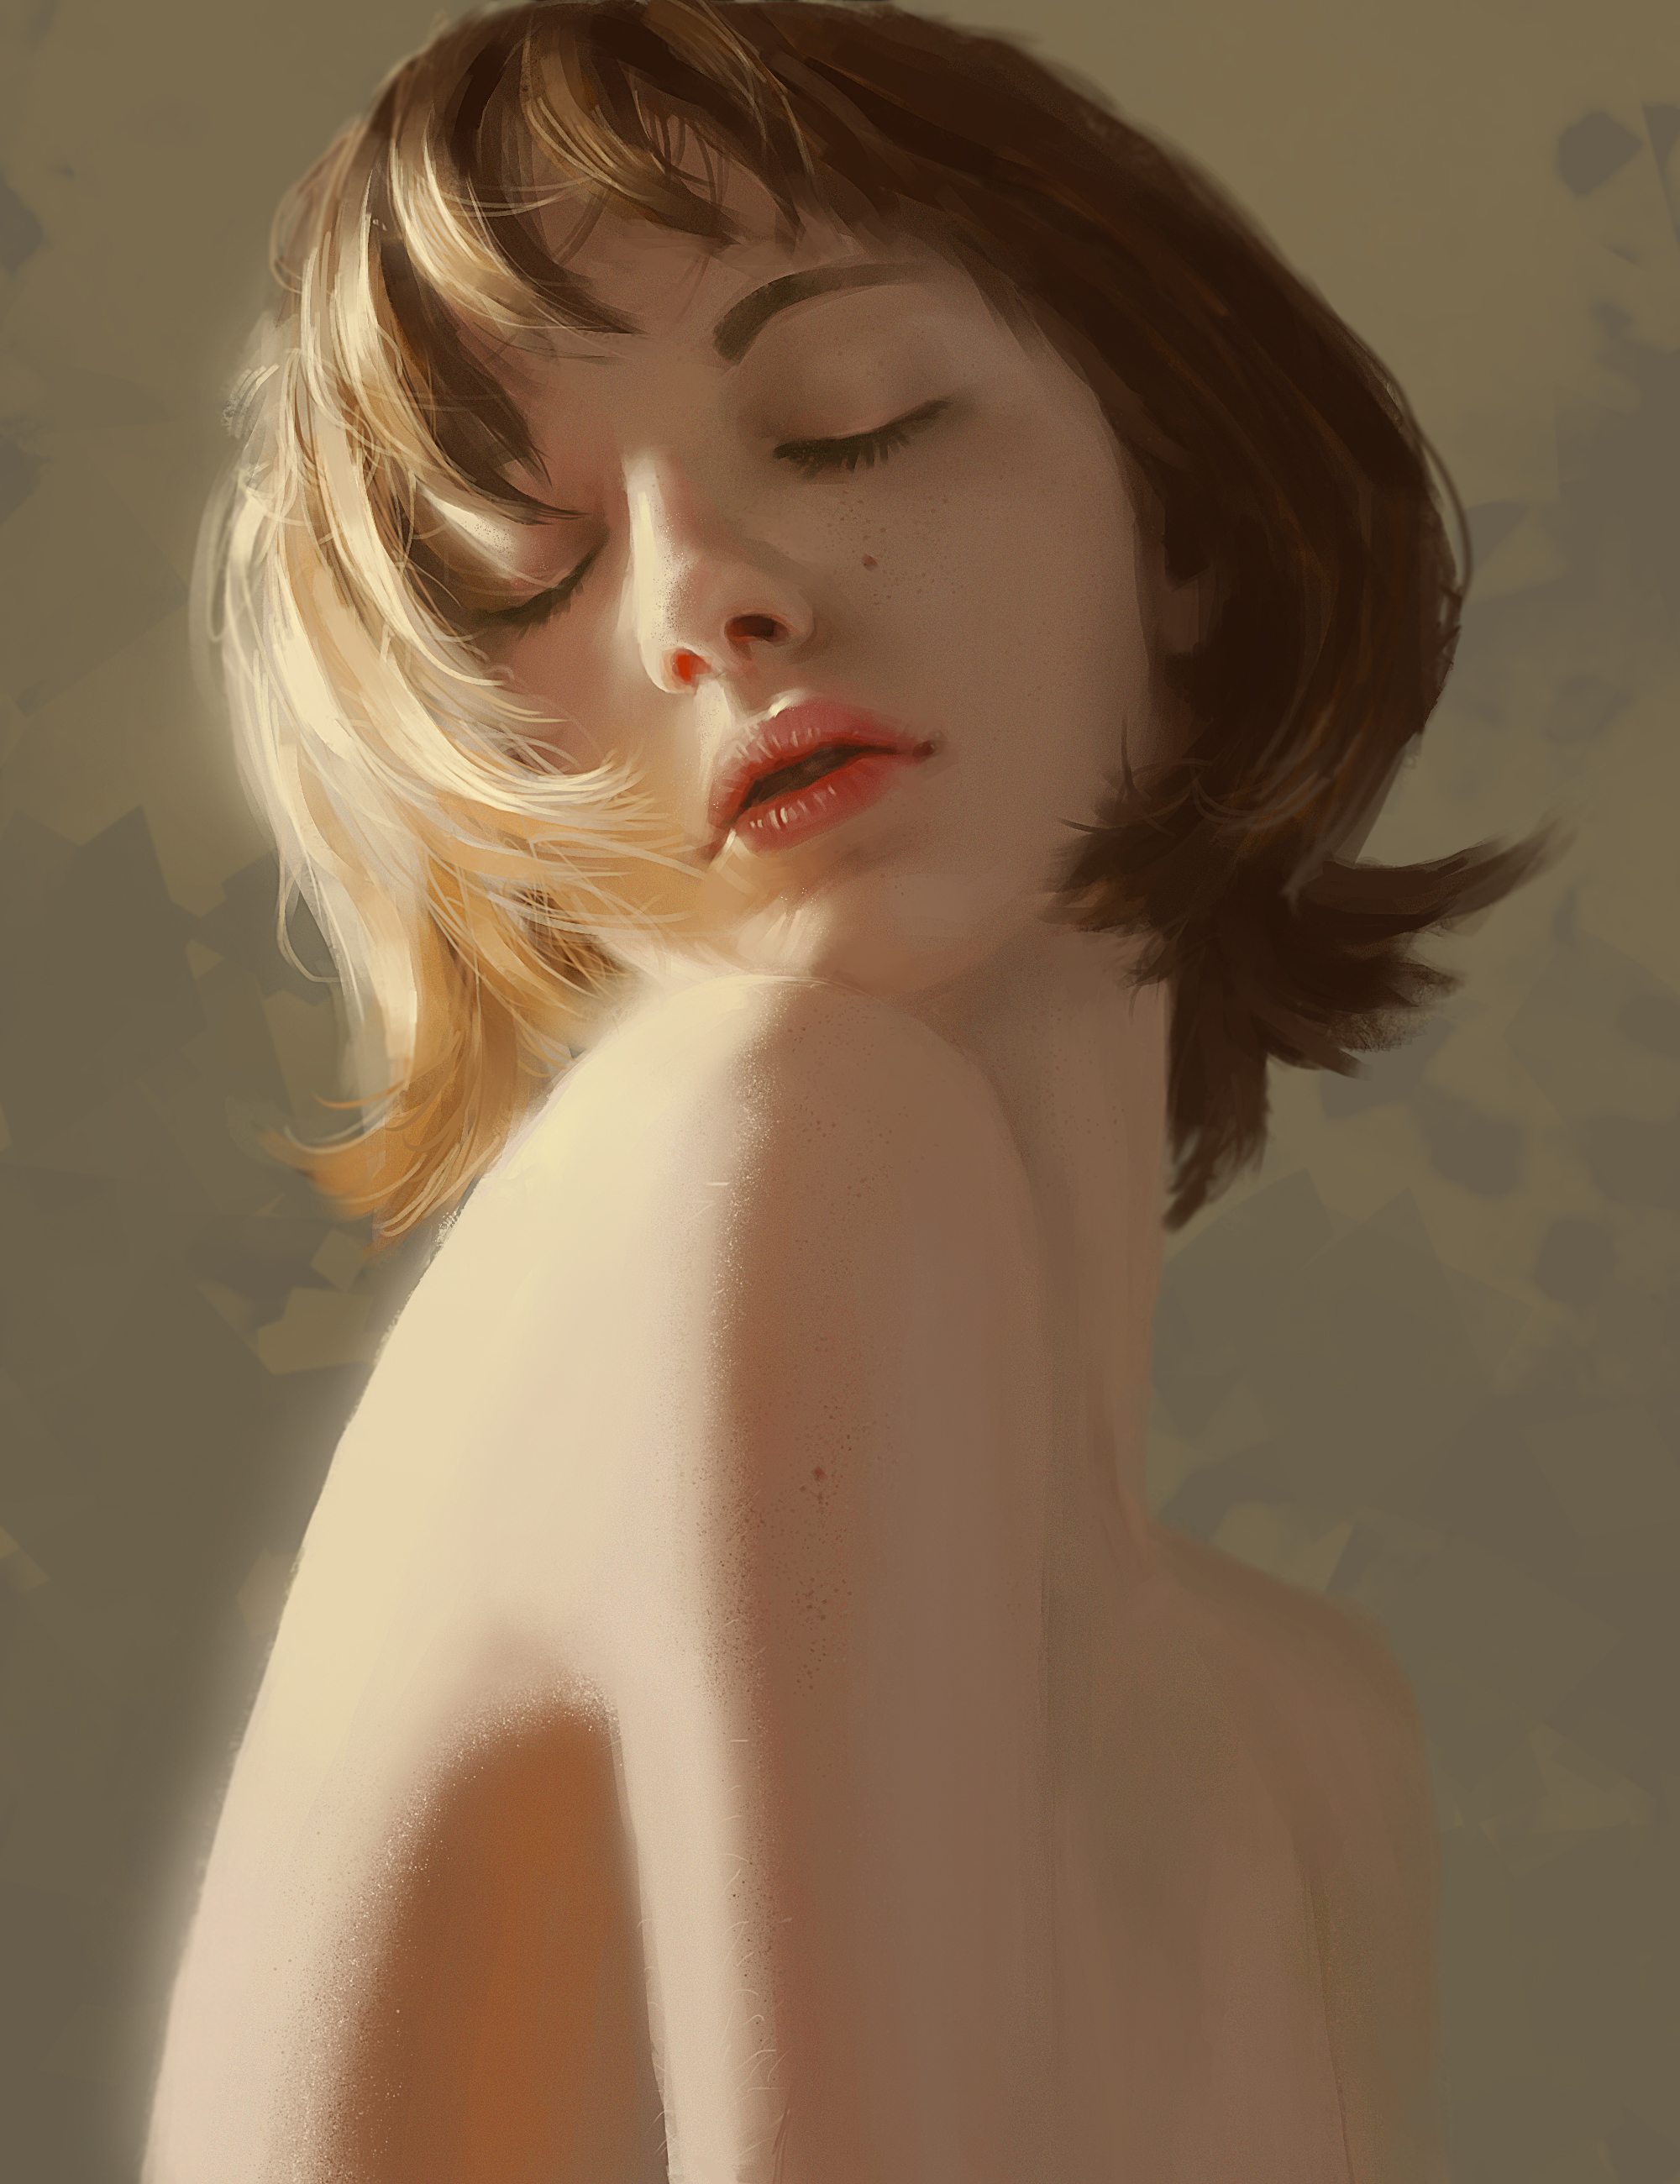 Girl Portrait By Vanduyart